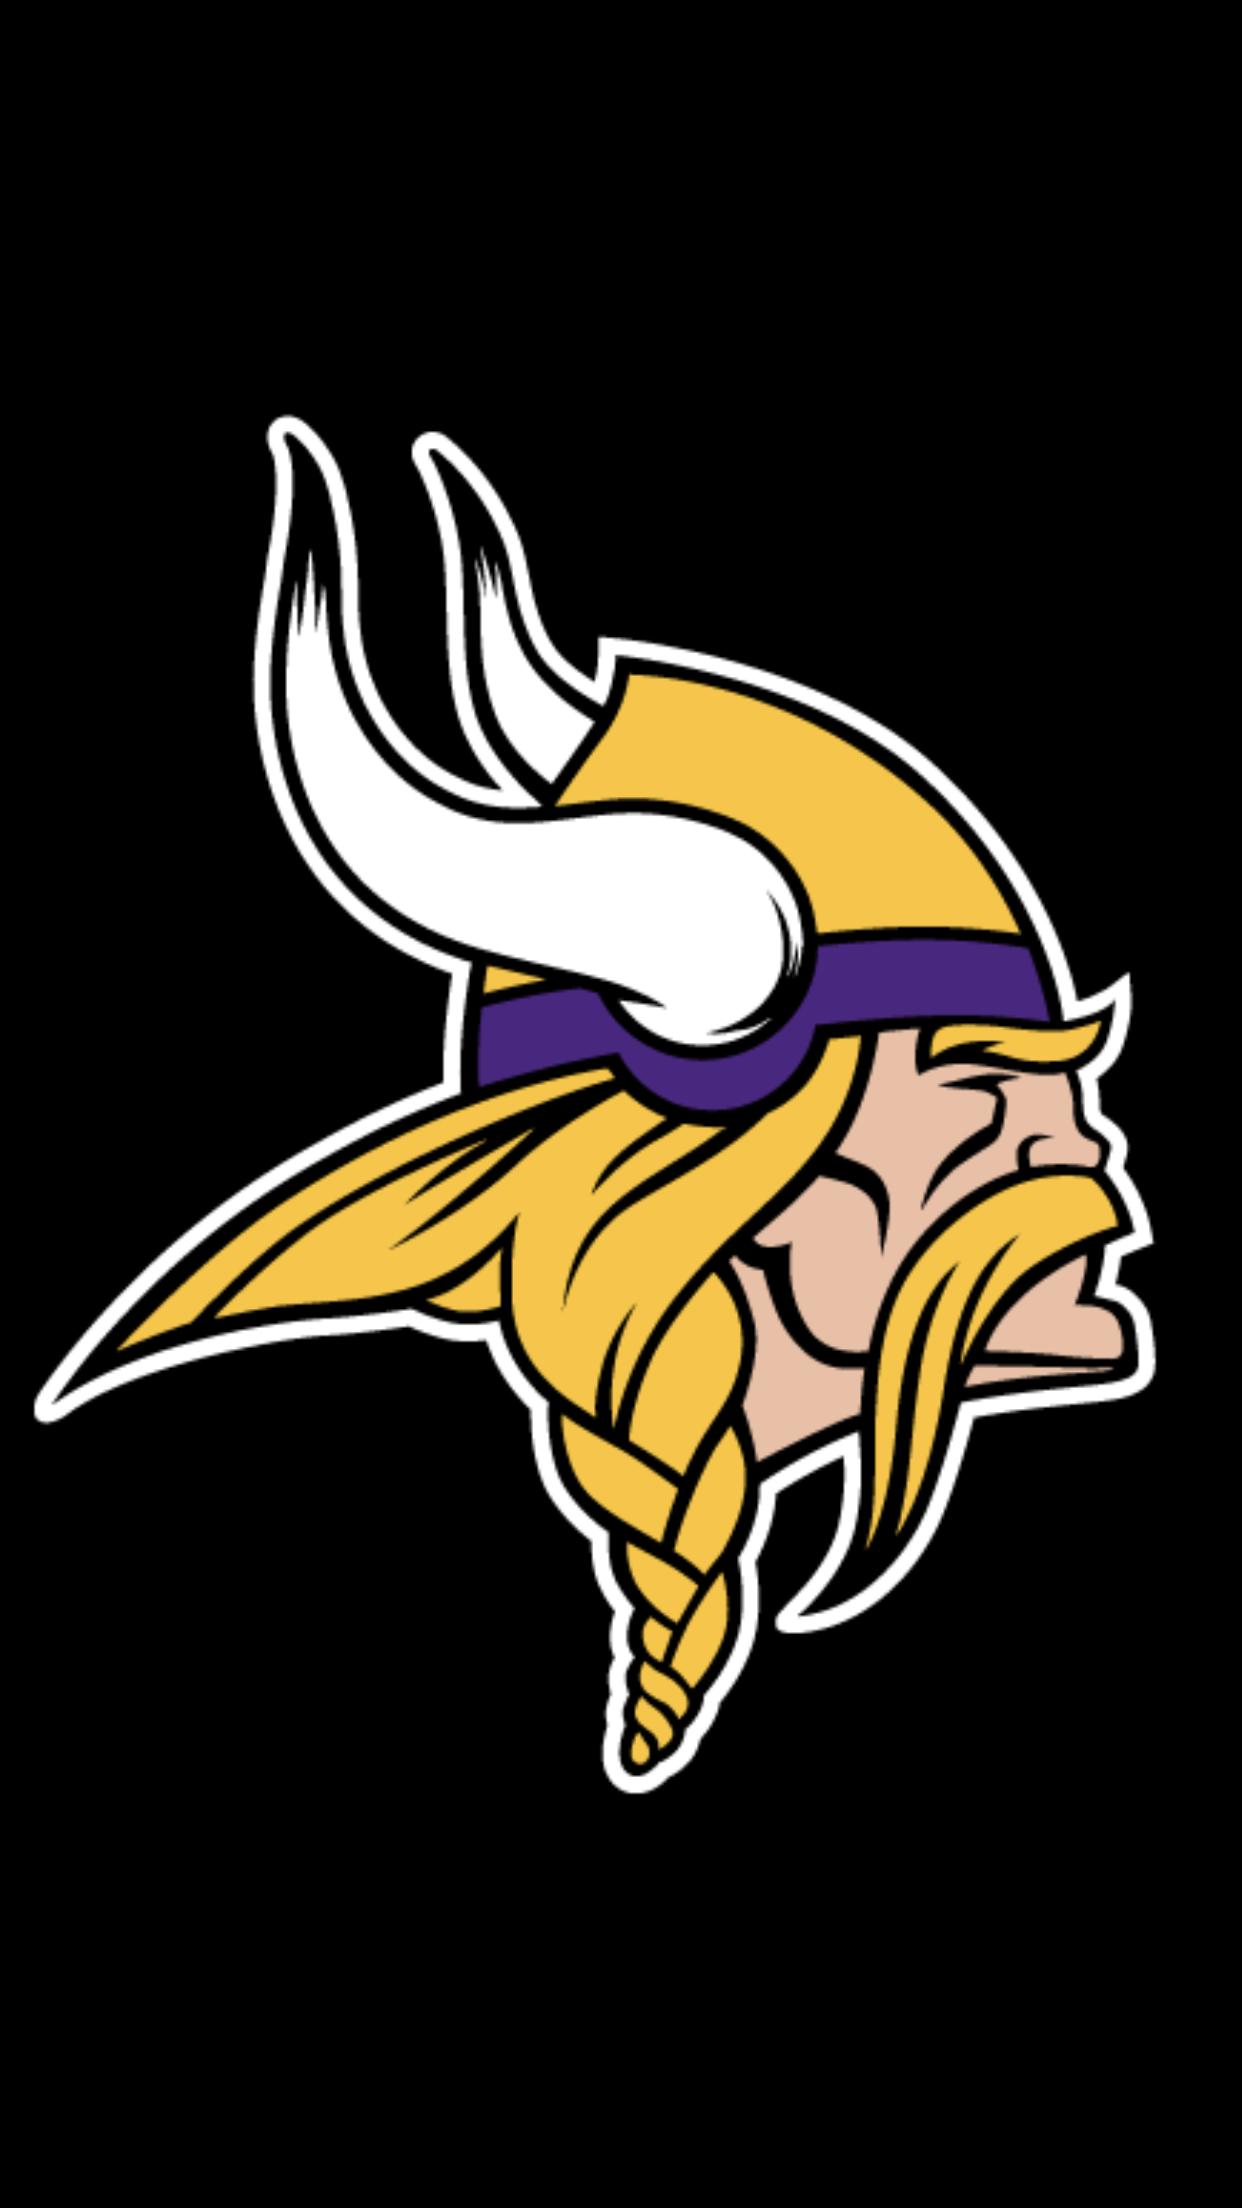 Pin By Austin Jones On Minnesota Vikings Minnesota Vikings Wallpaper Minnesota Vikings Logo Minnesota Vikings